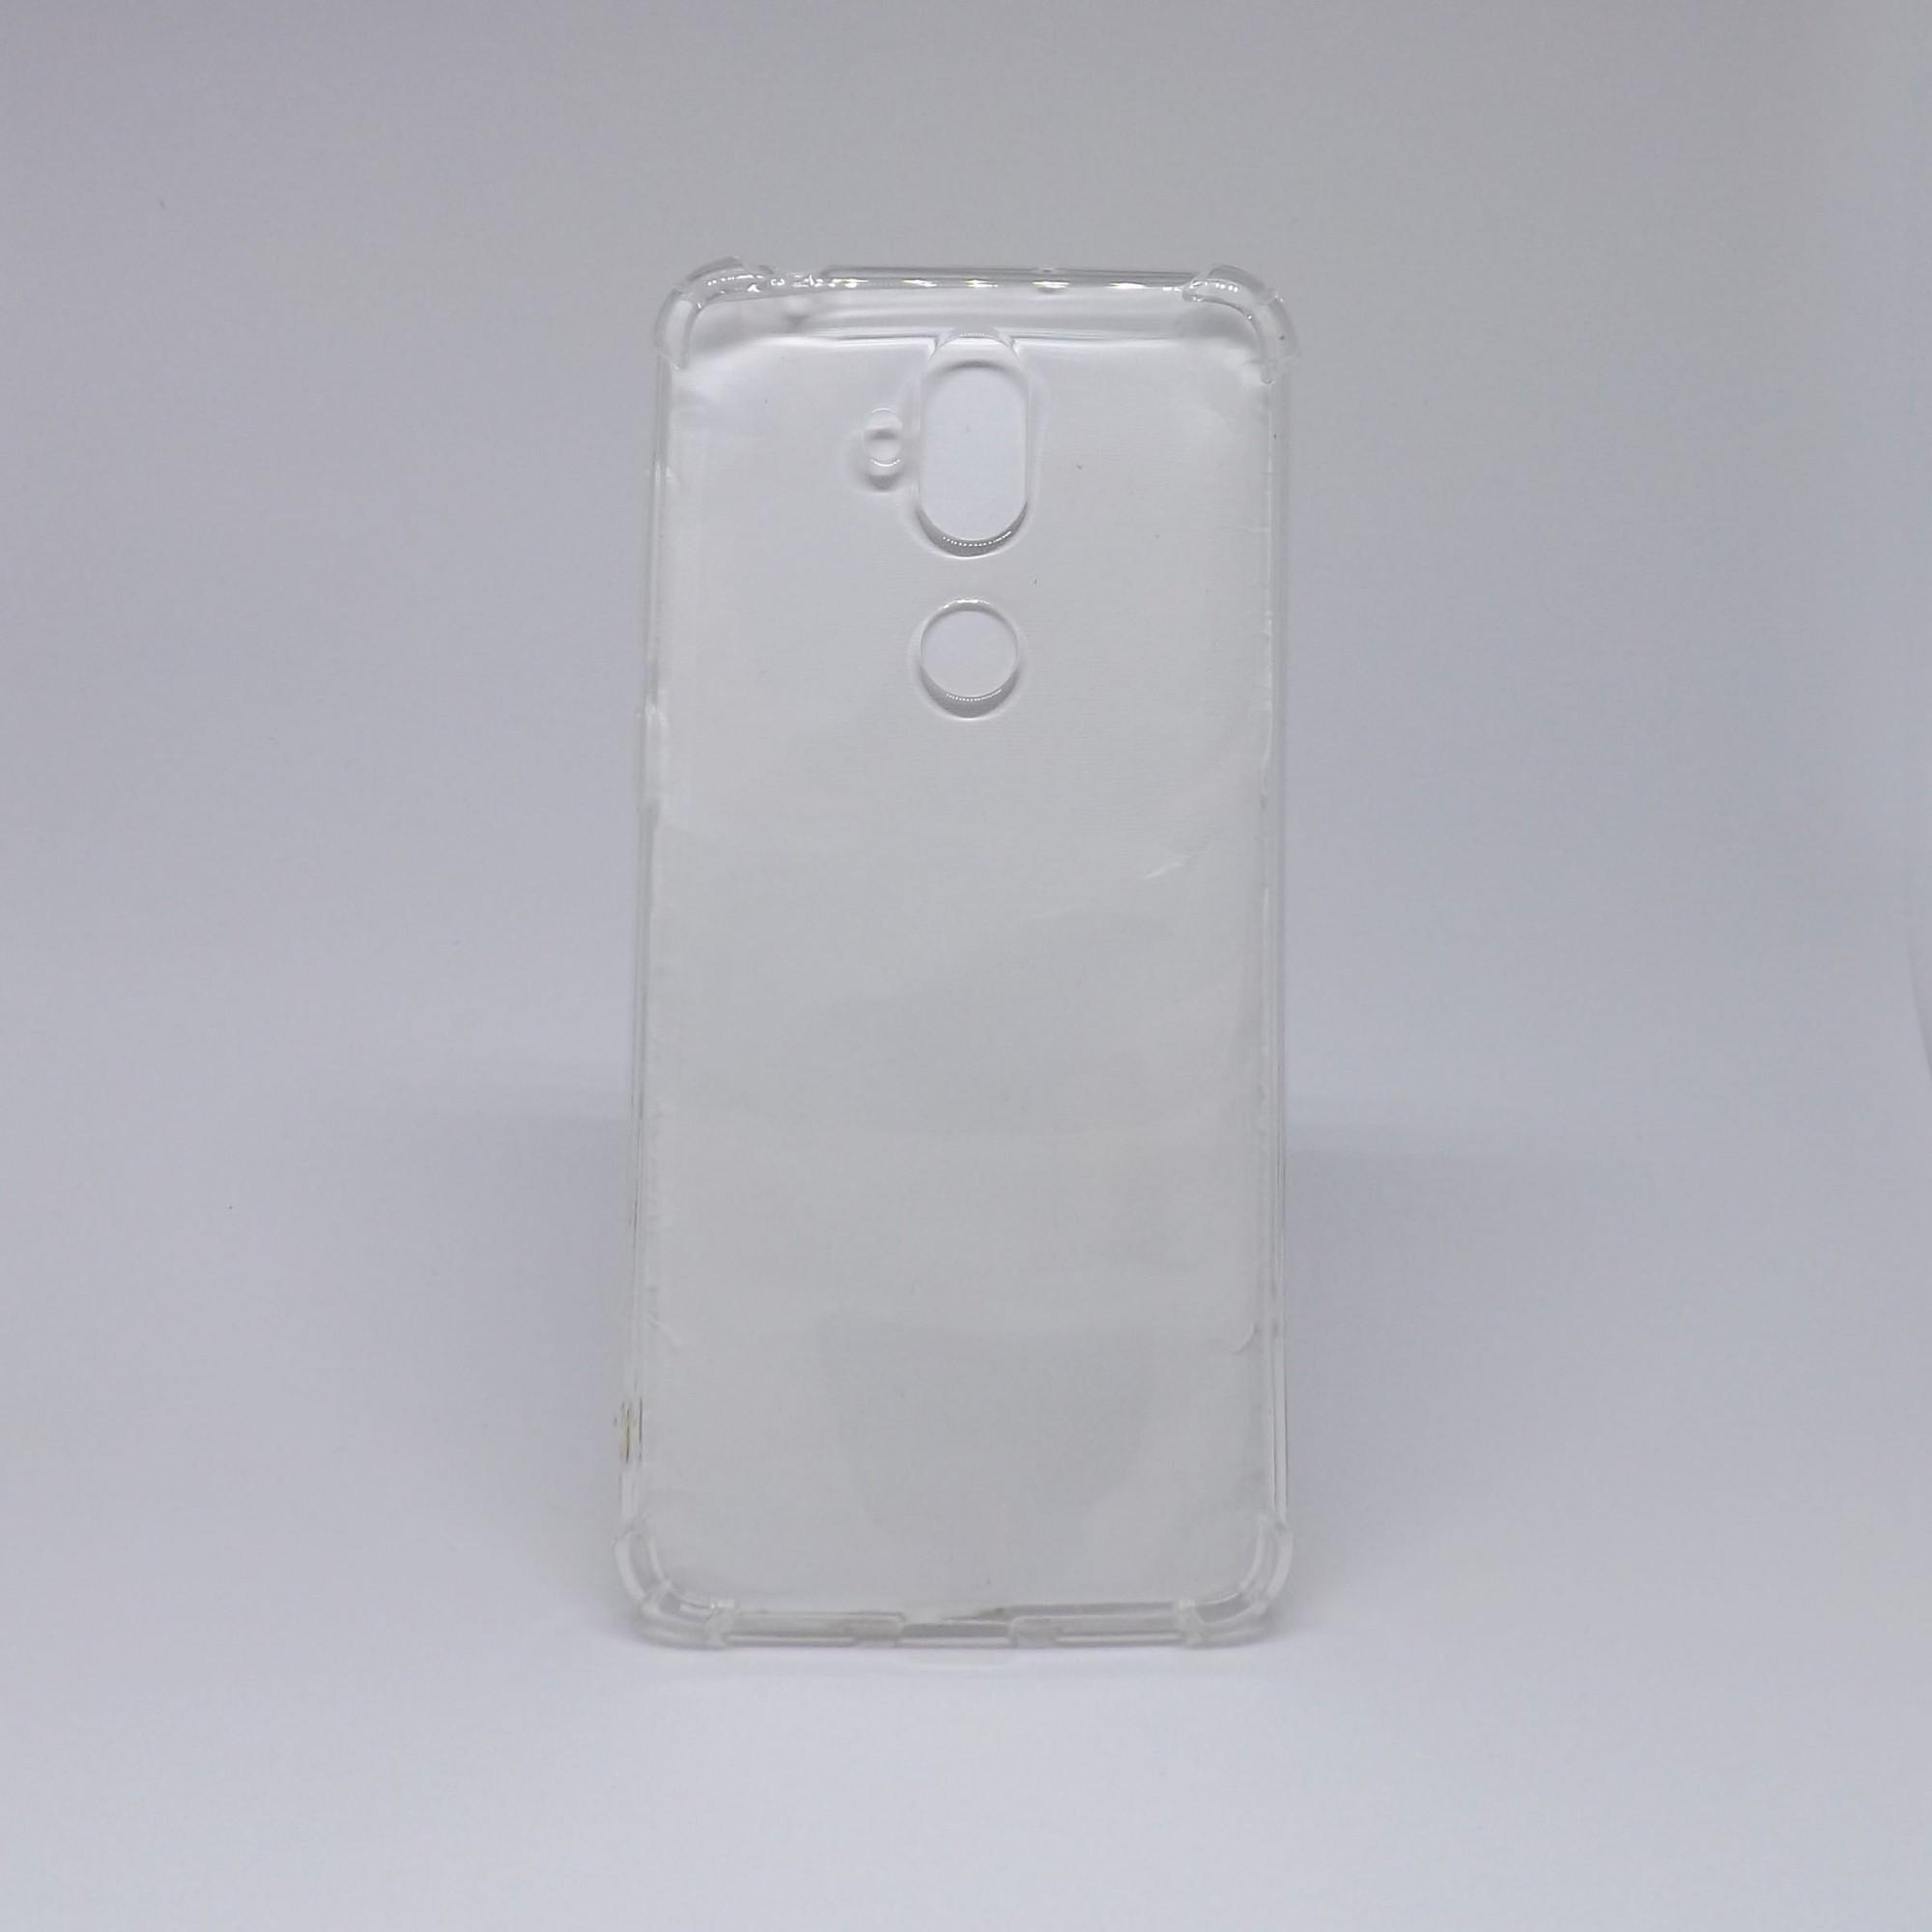 Capa Asus Zenfone 5 Selfie Transparente